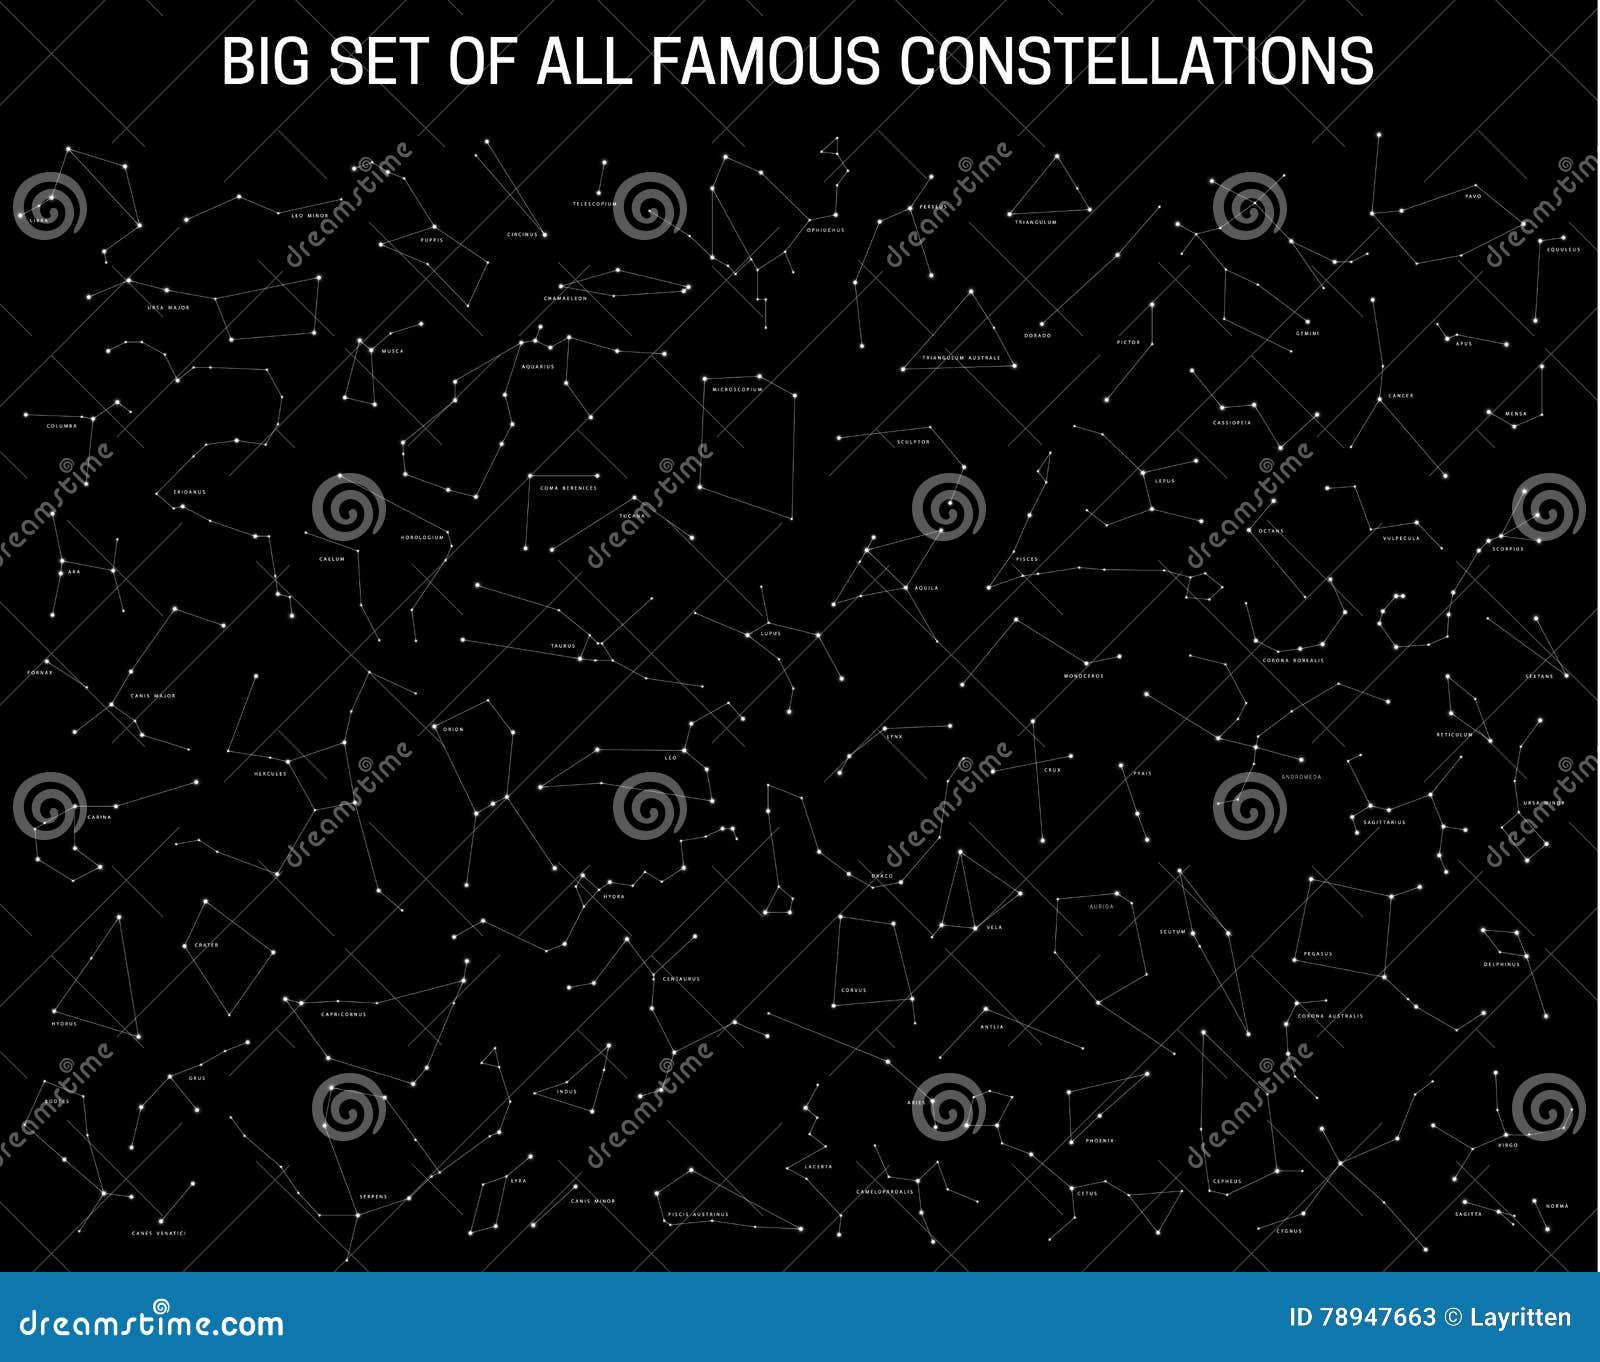 famous stars astronomy - photo #26